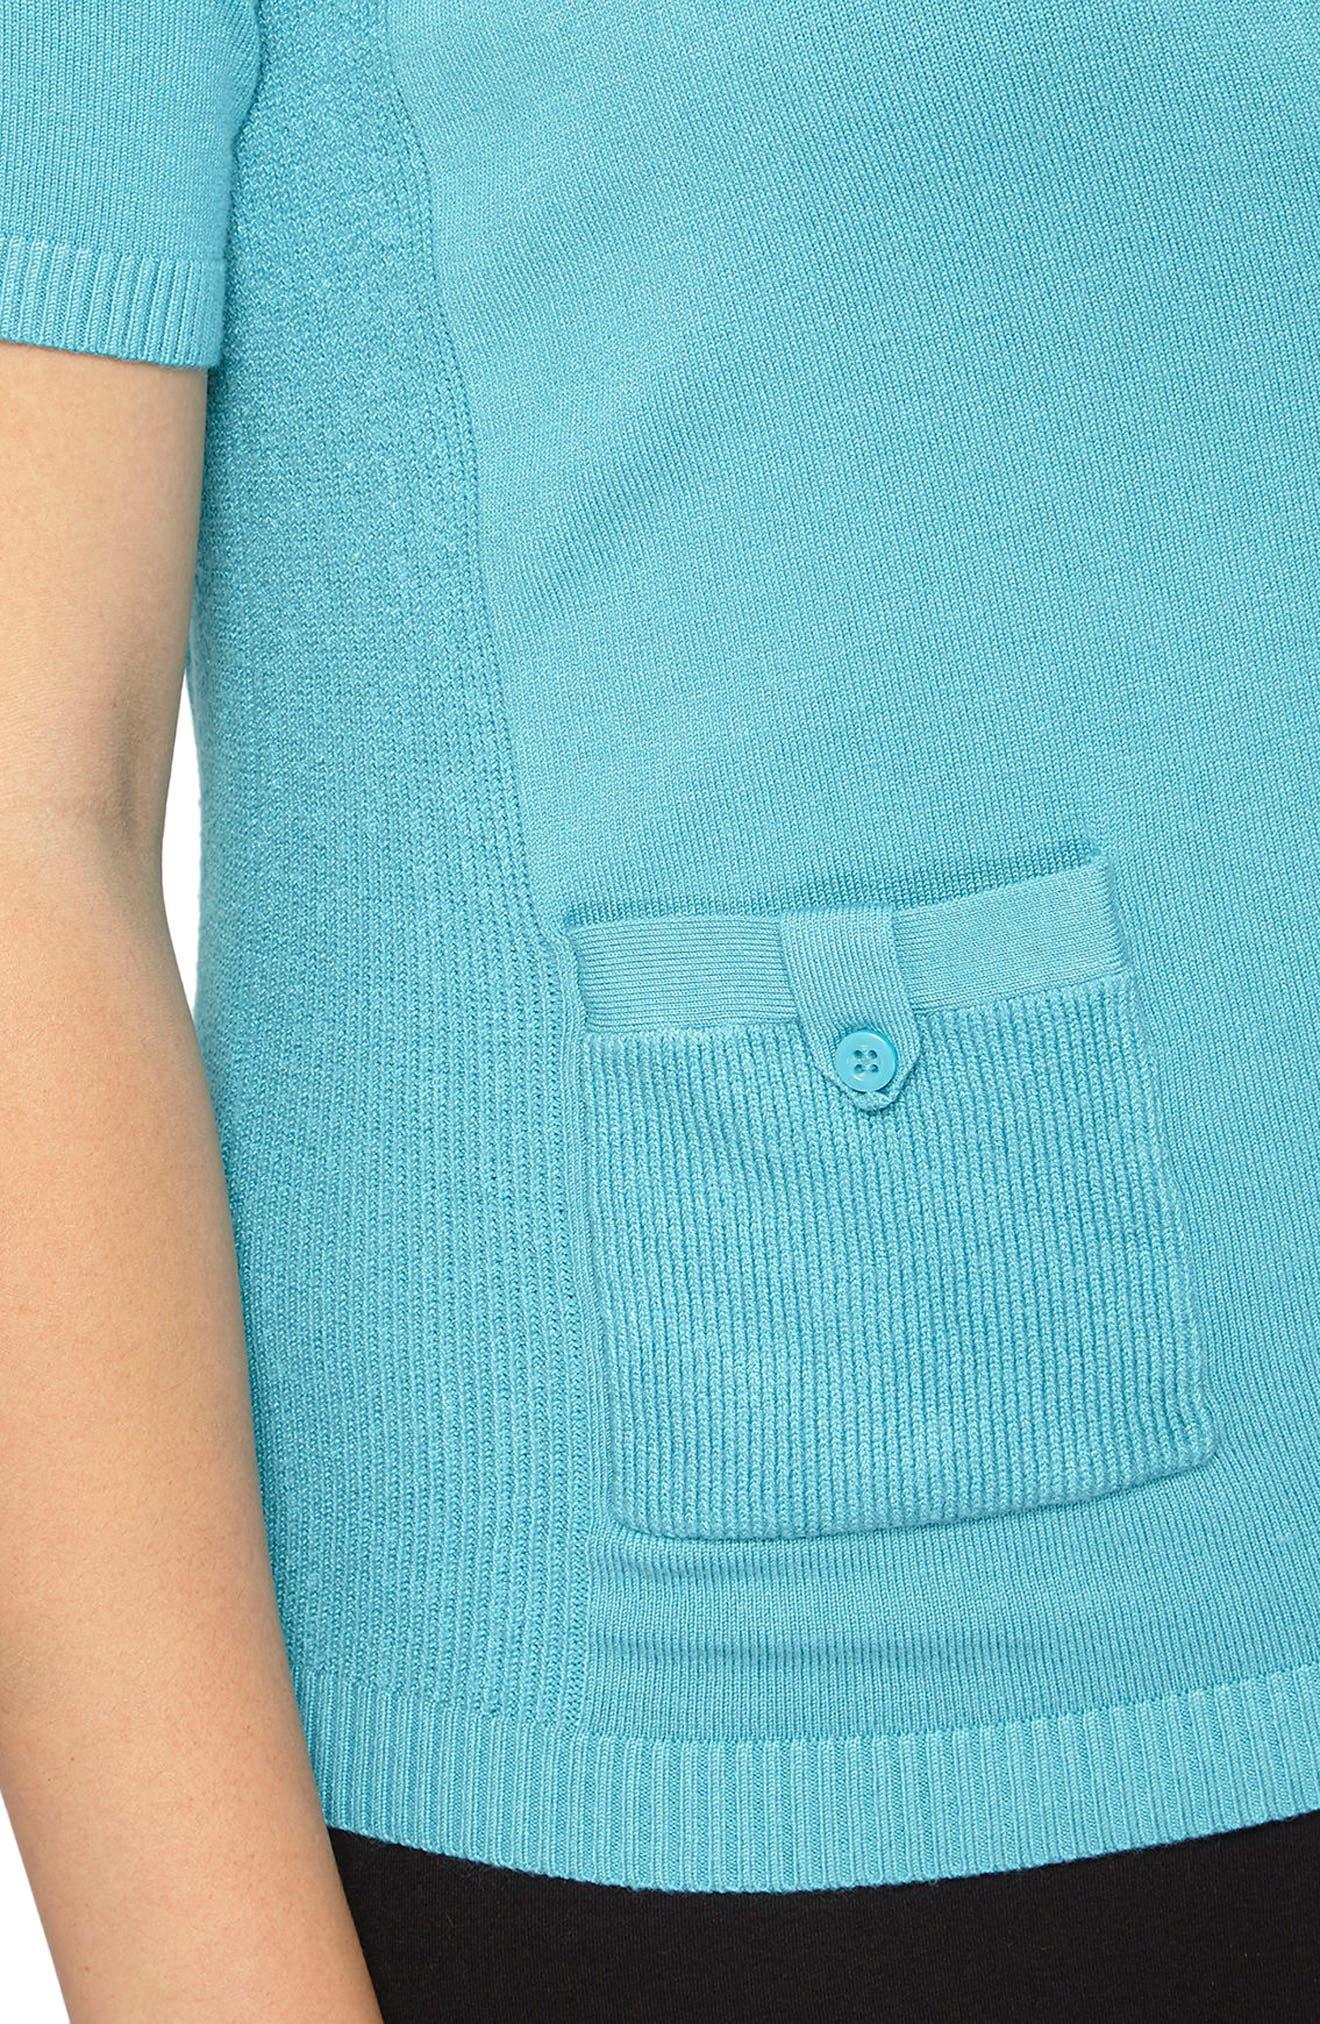 Tab Pocket Cardigan,                             Alternate thumbnail 3, color,                             430